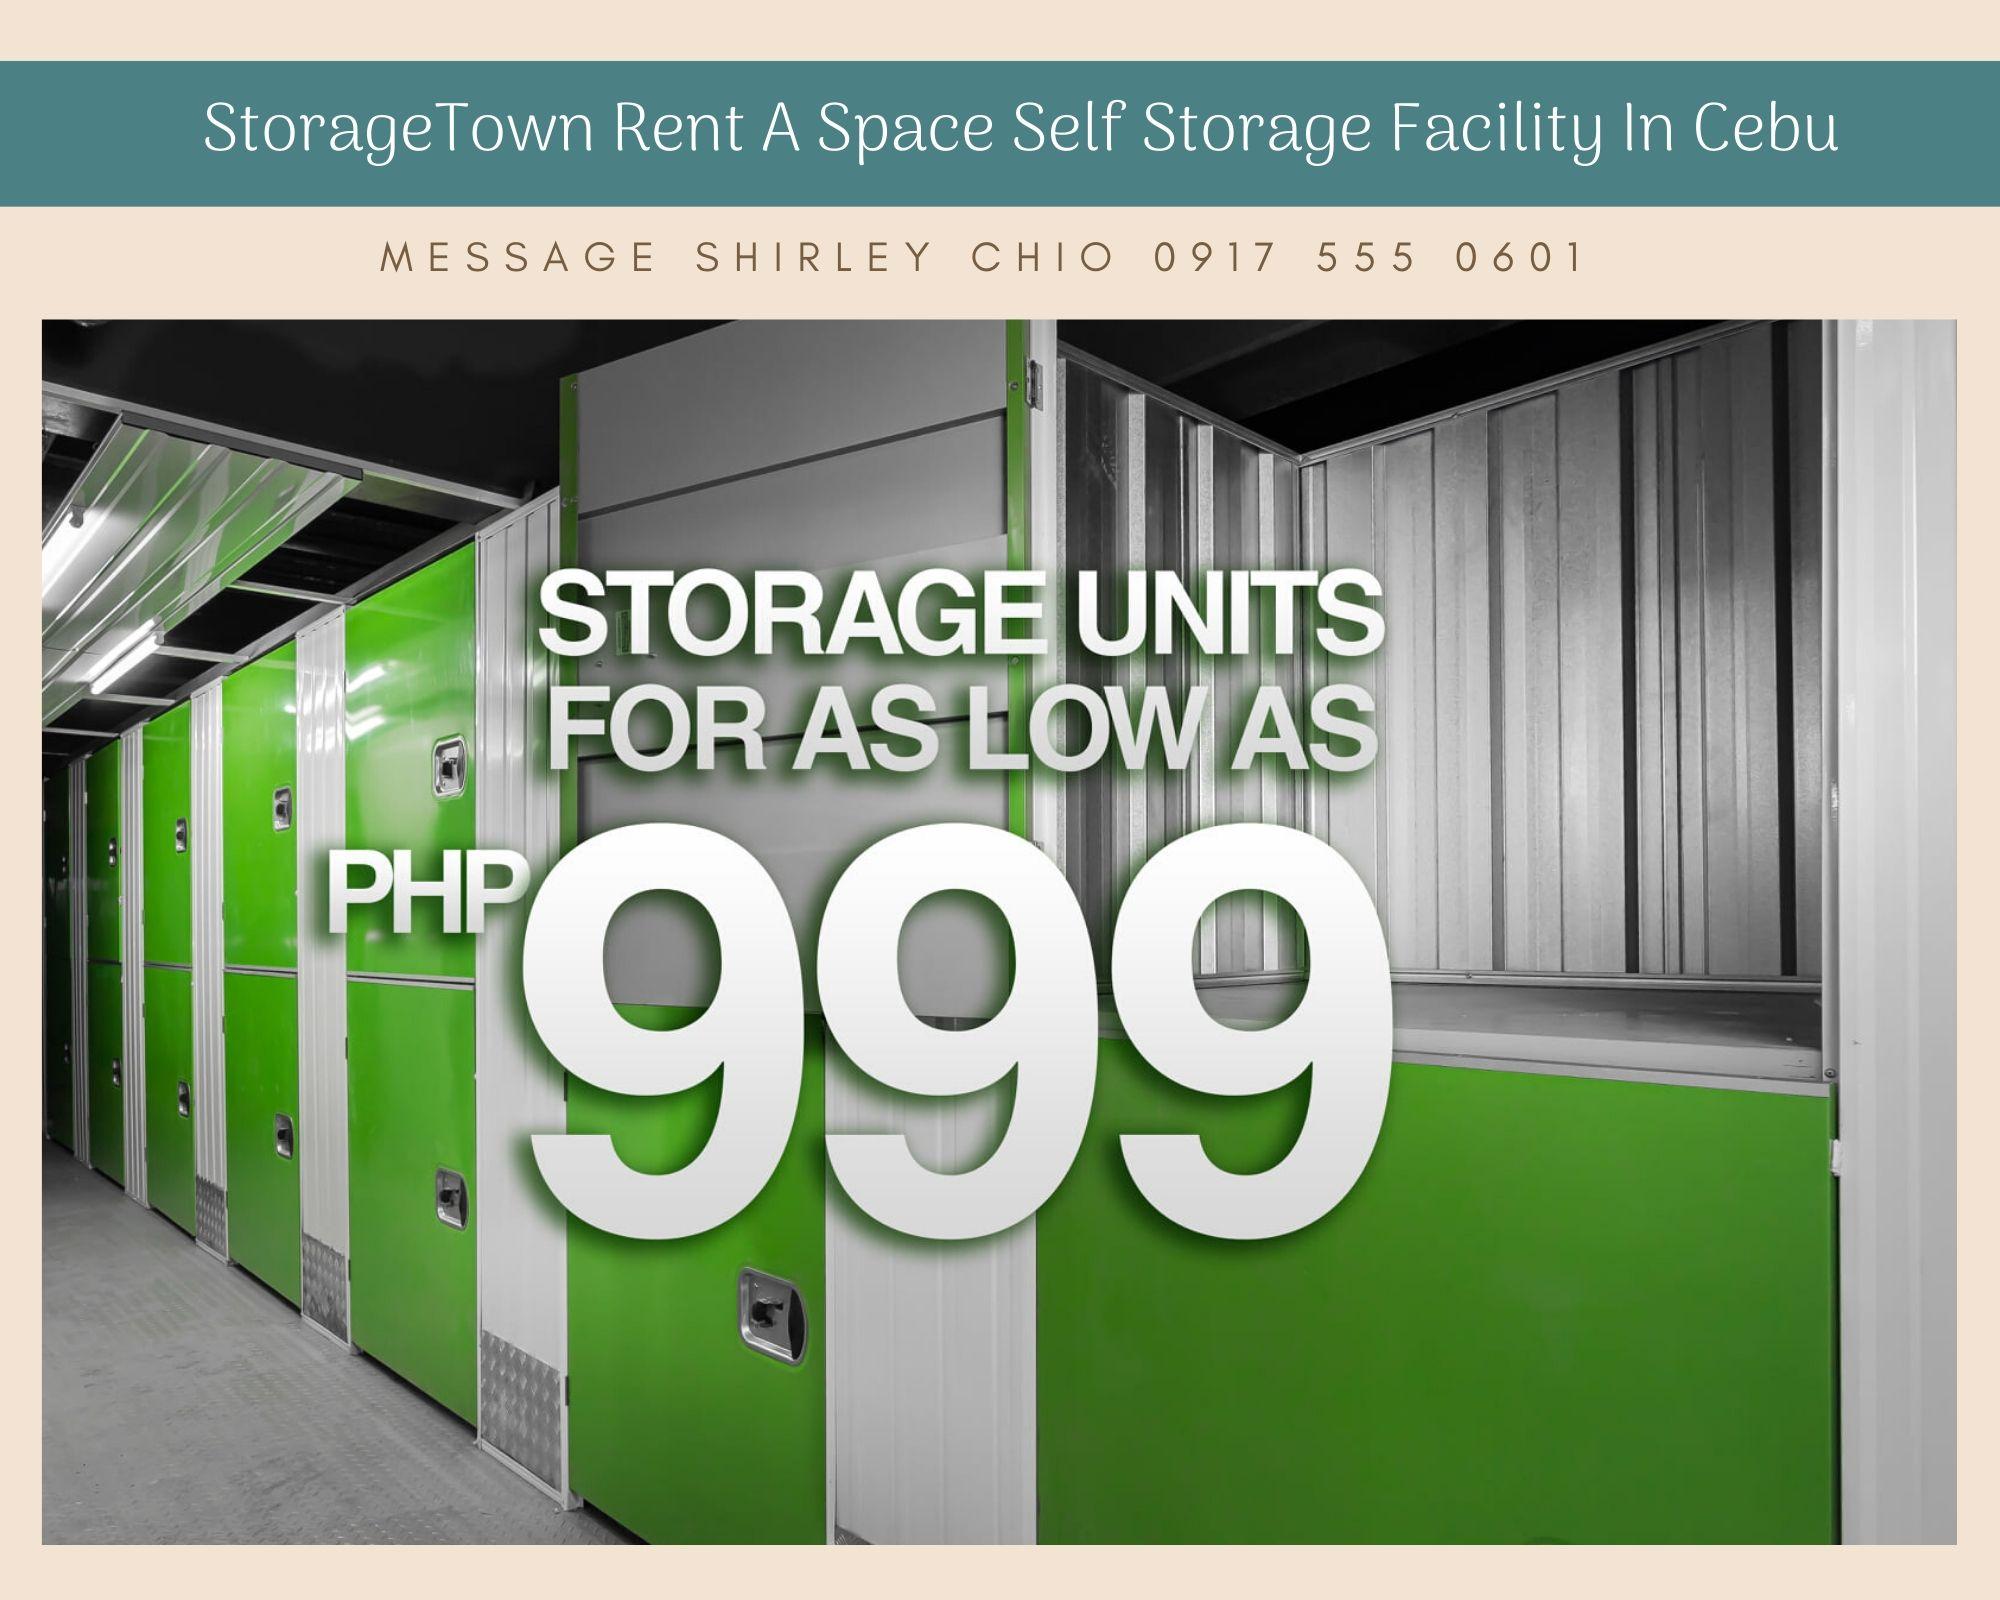 Mini Storage Warehouse StorageTown in Cebu Philippines